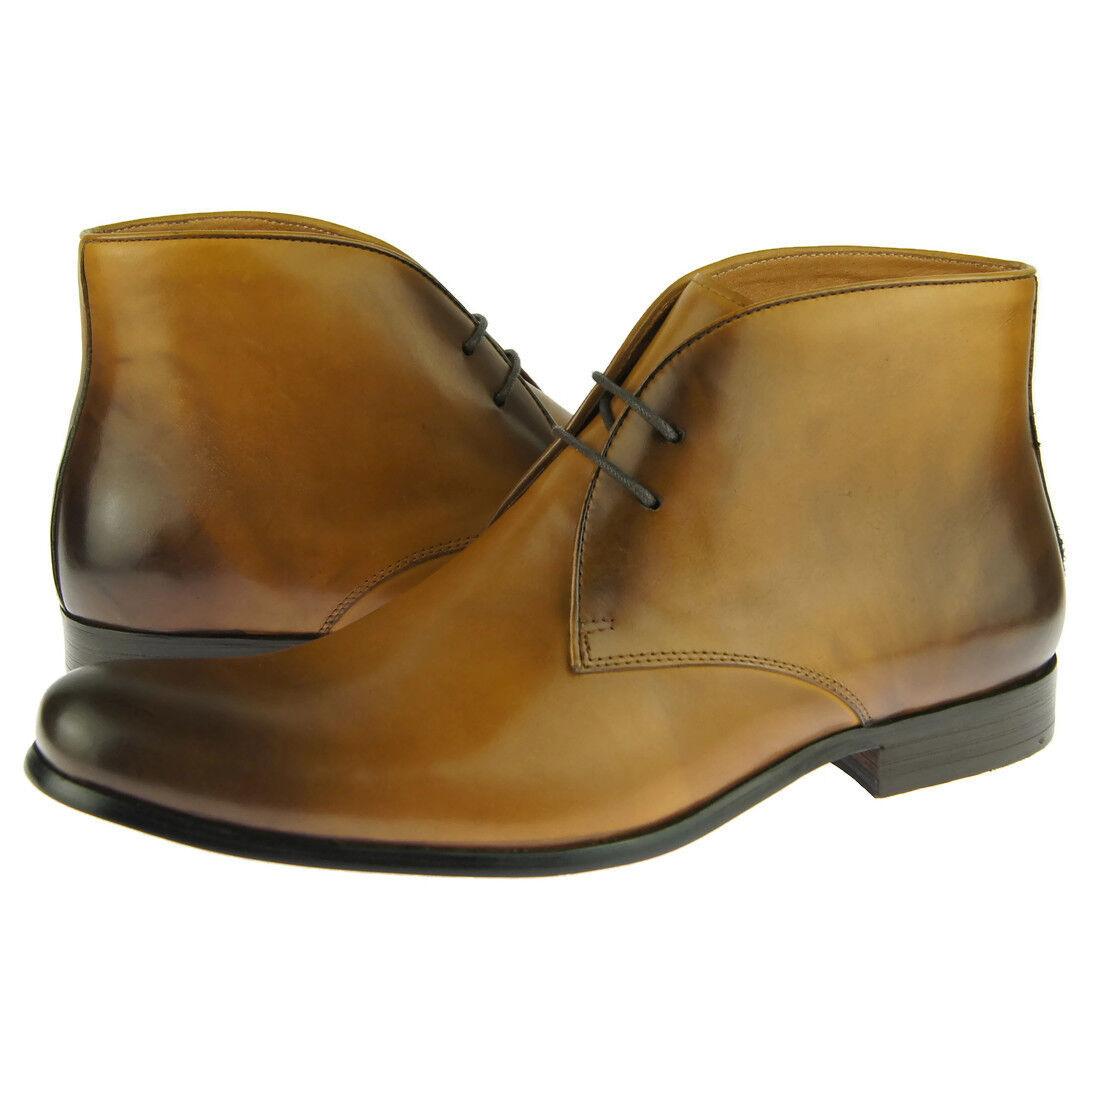 Carrucci Men's Chukka, Leather Ankle Boots, Cognac